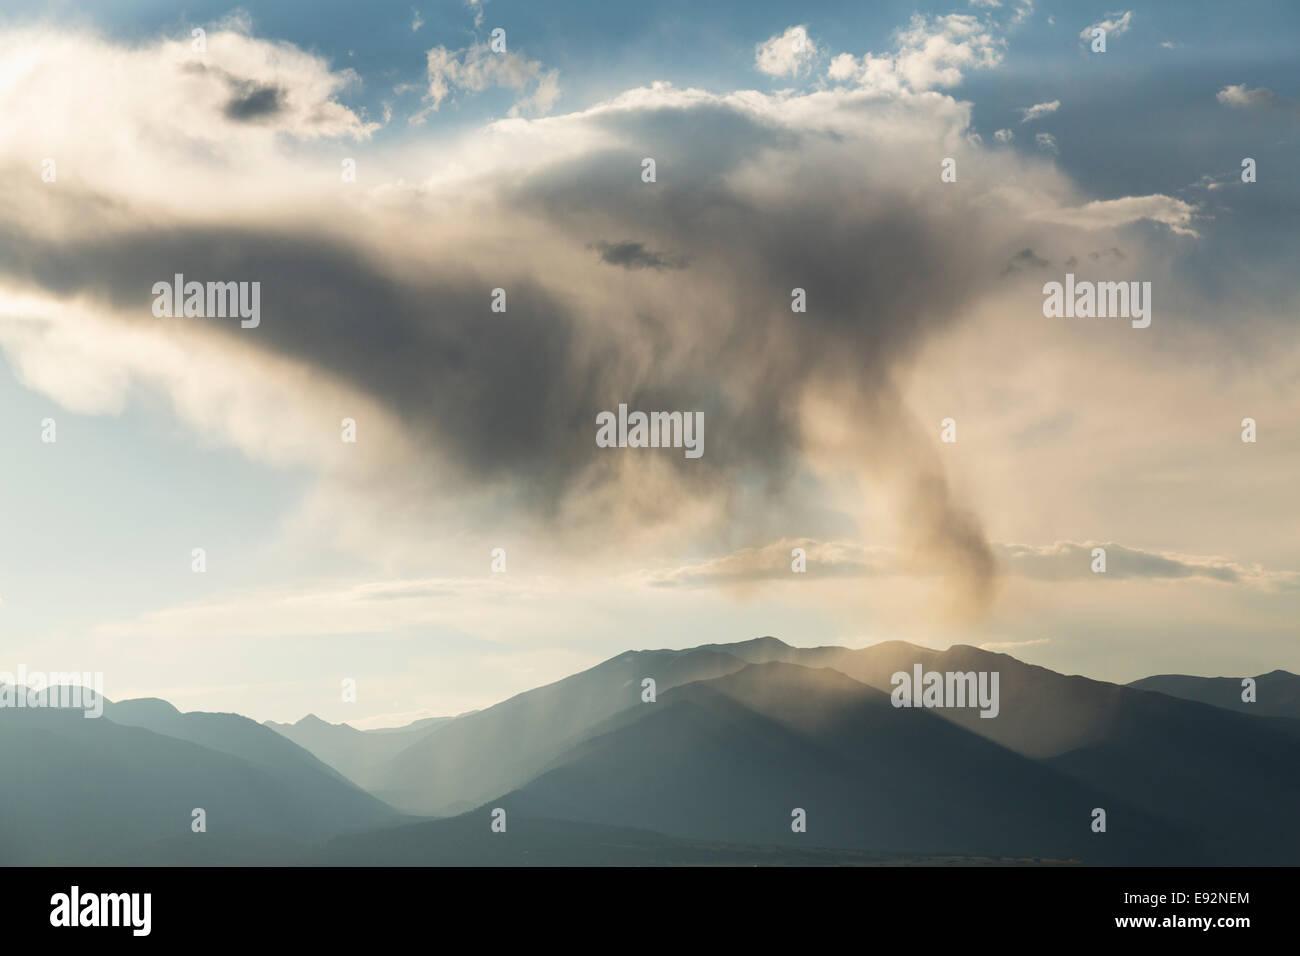 Rain cloud with rain spout over the Colorado mountains, USA - Stock Image